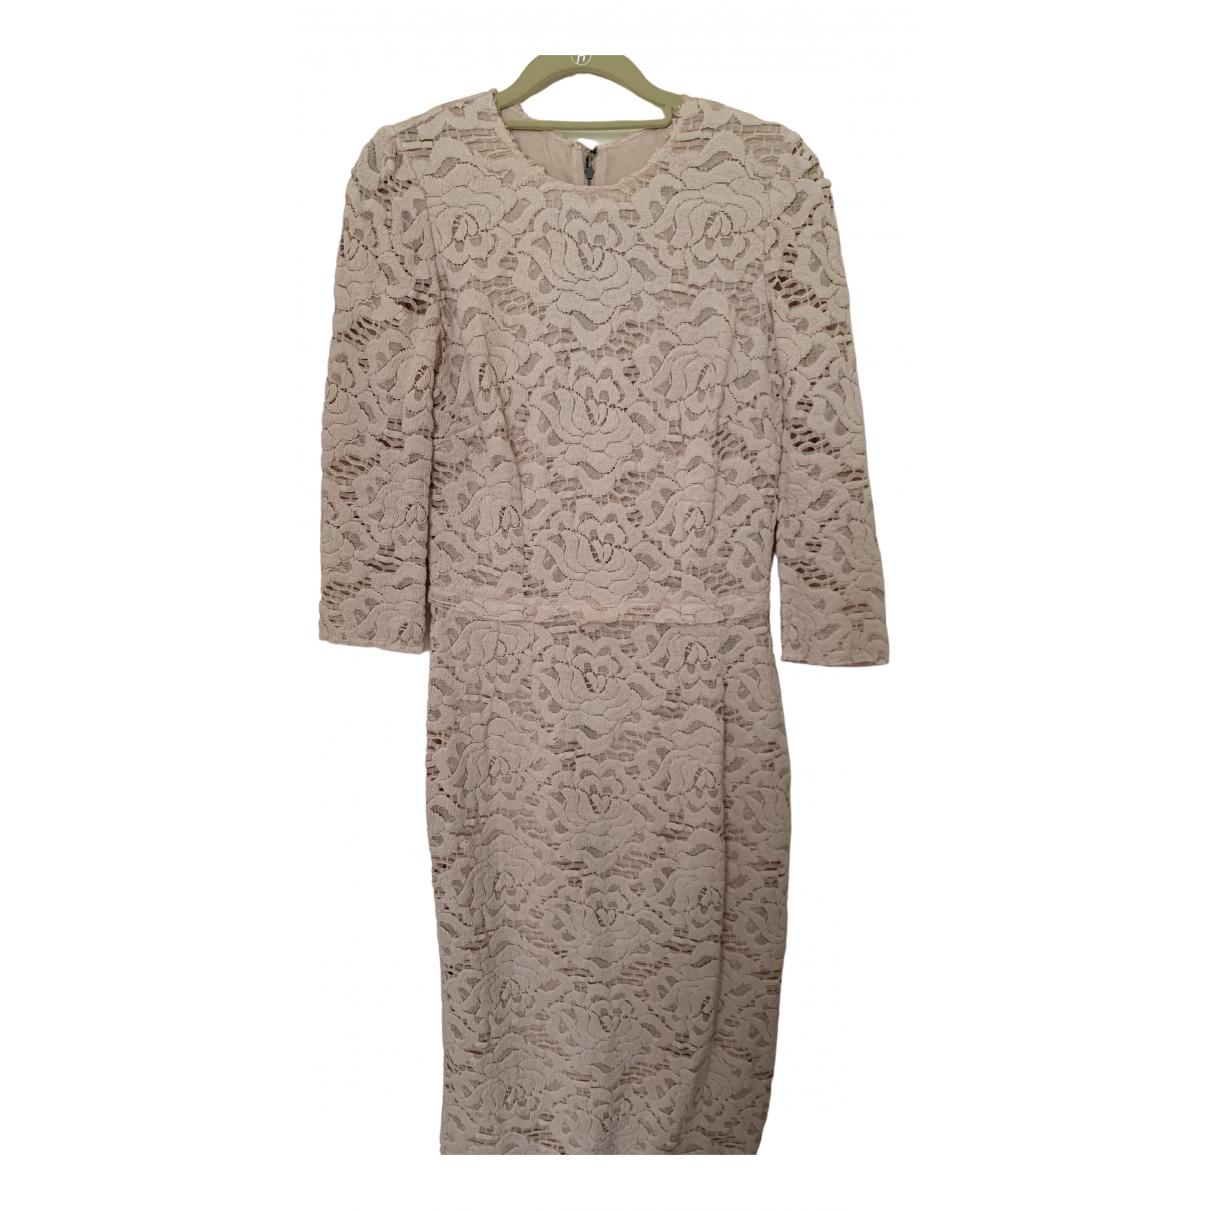 Dolce & Gabbana \N Pink Cotton dress for Women 42 IT